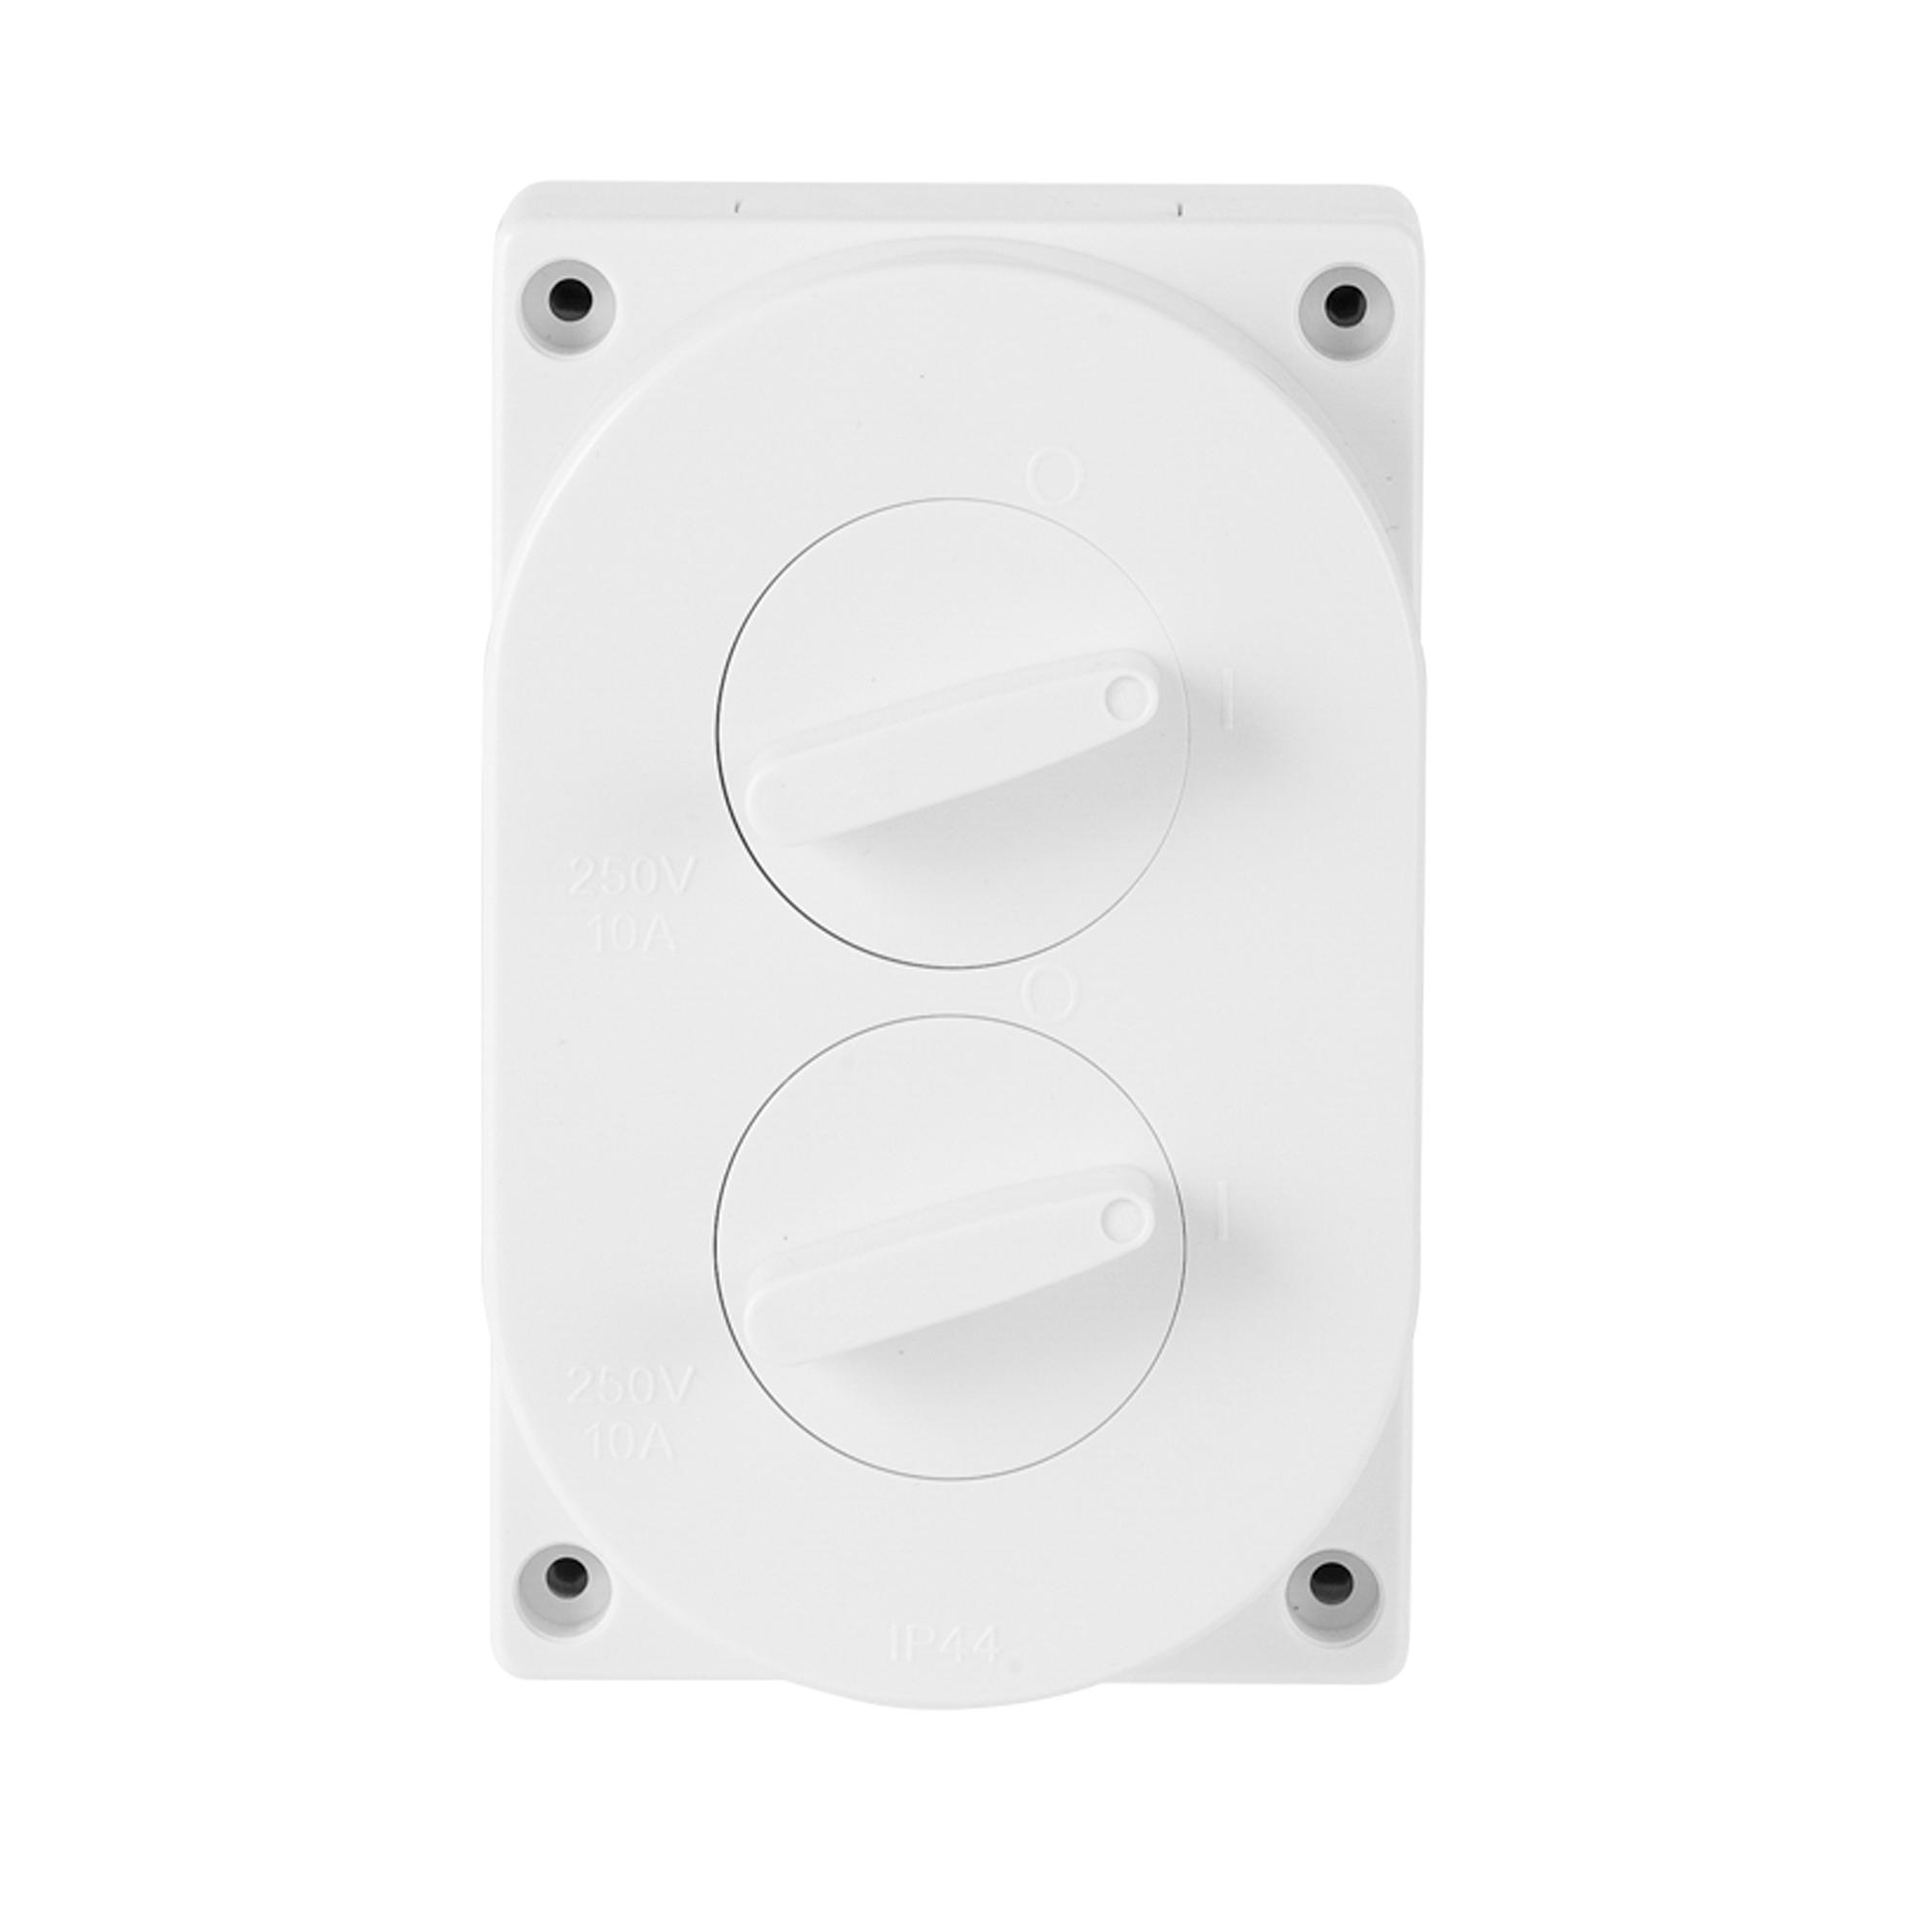 2 gang weatherproof switch